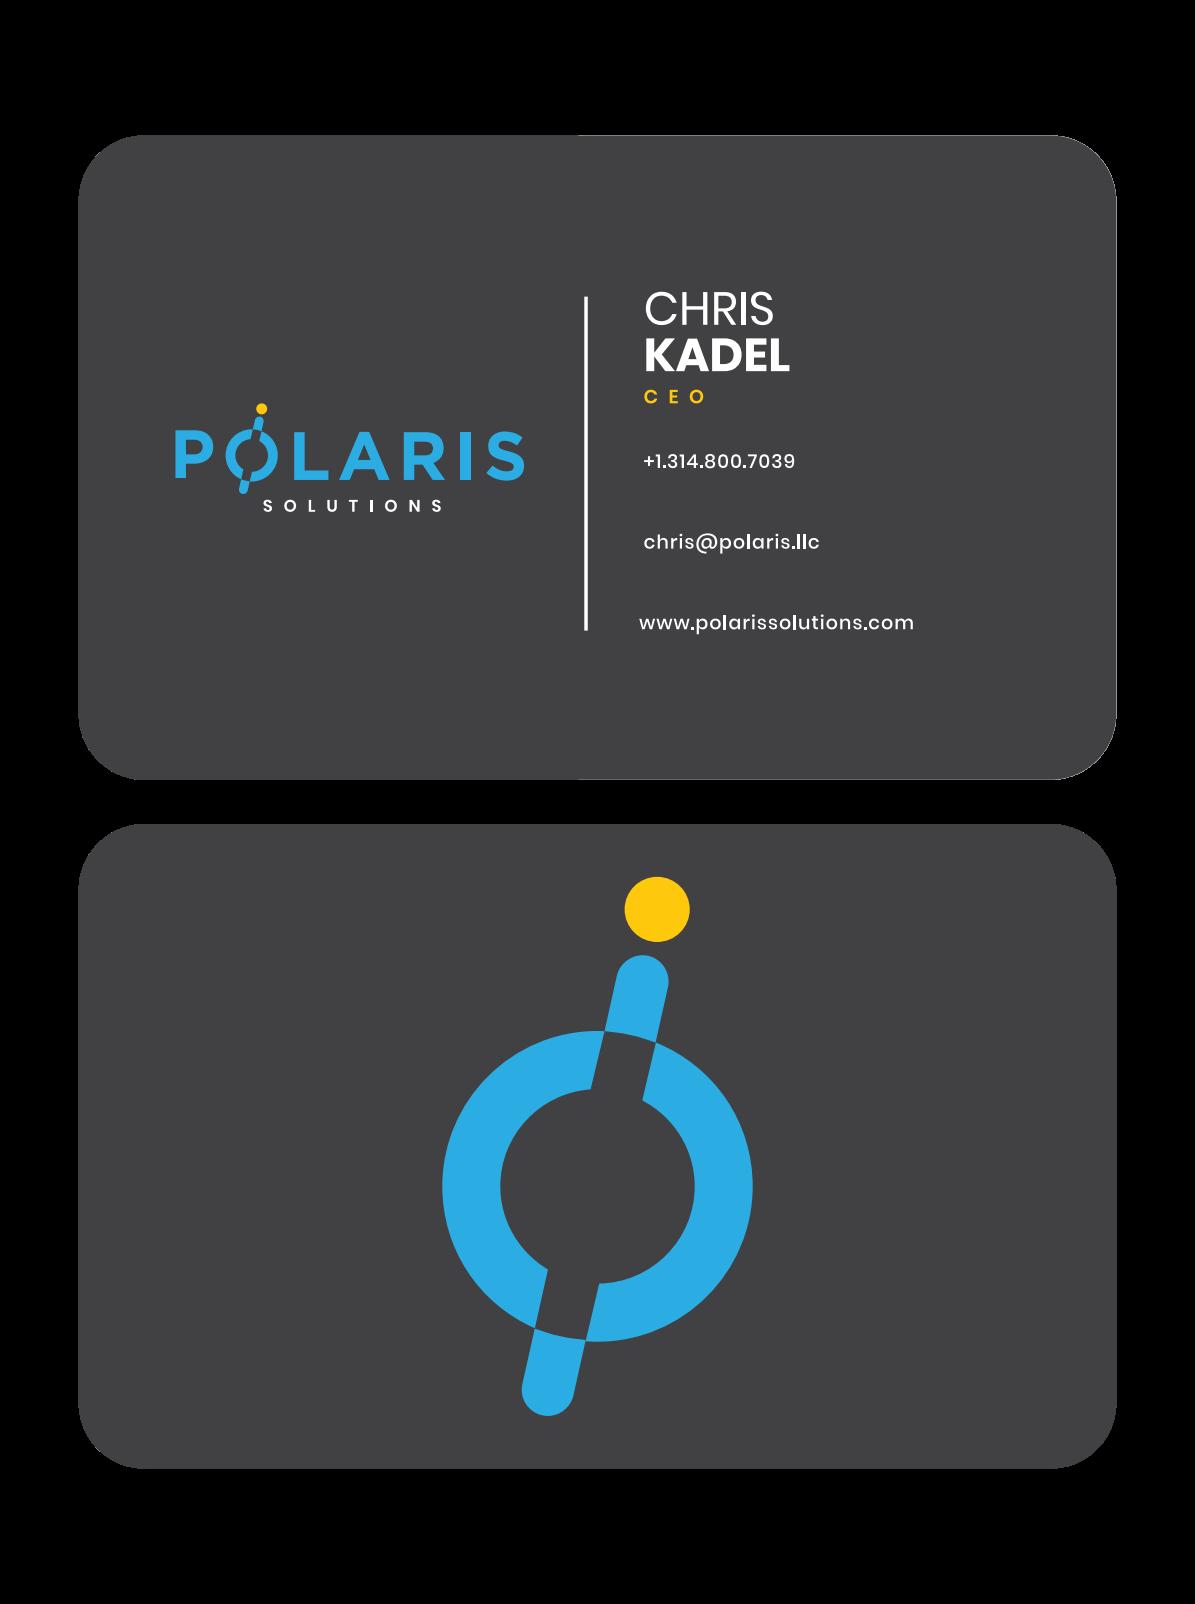 Polaris Solutions Business Card Design